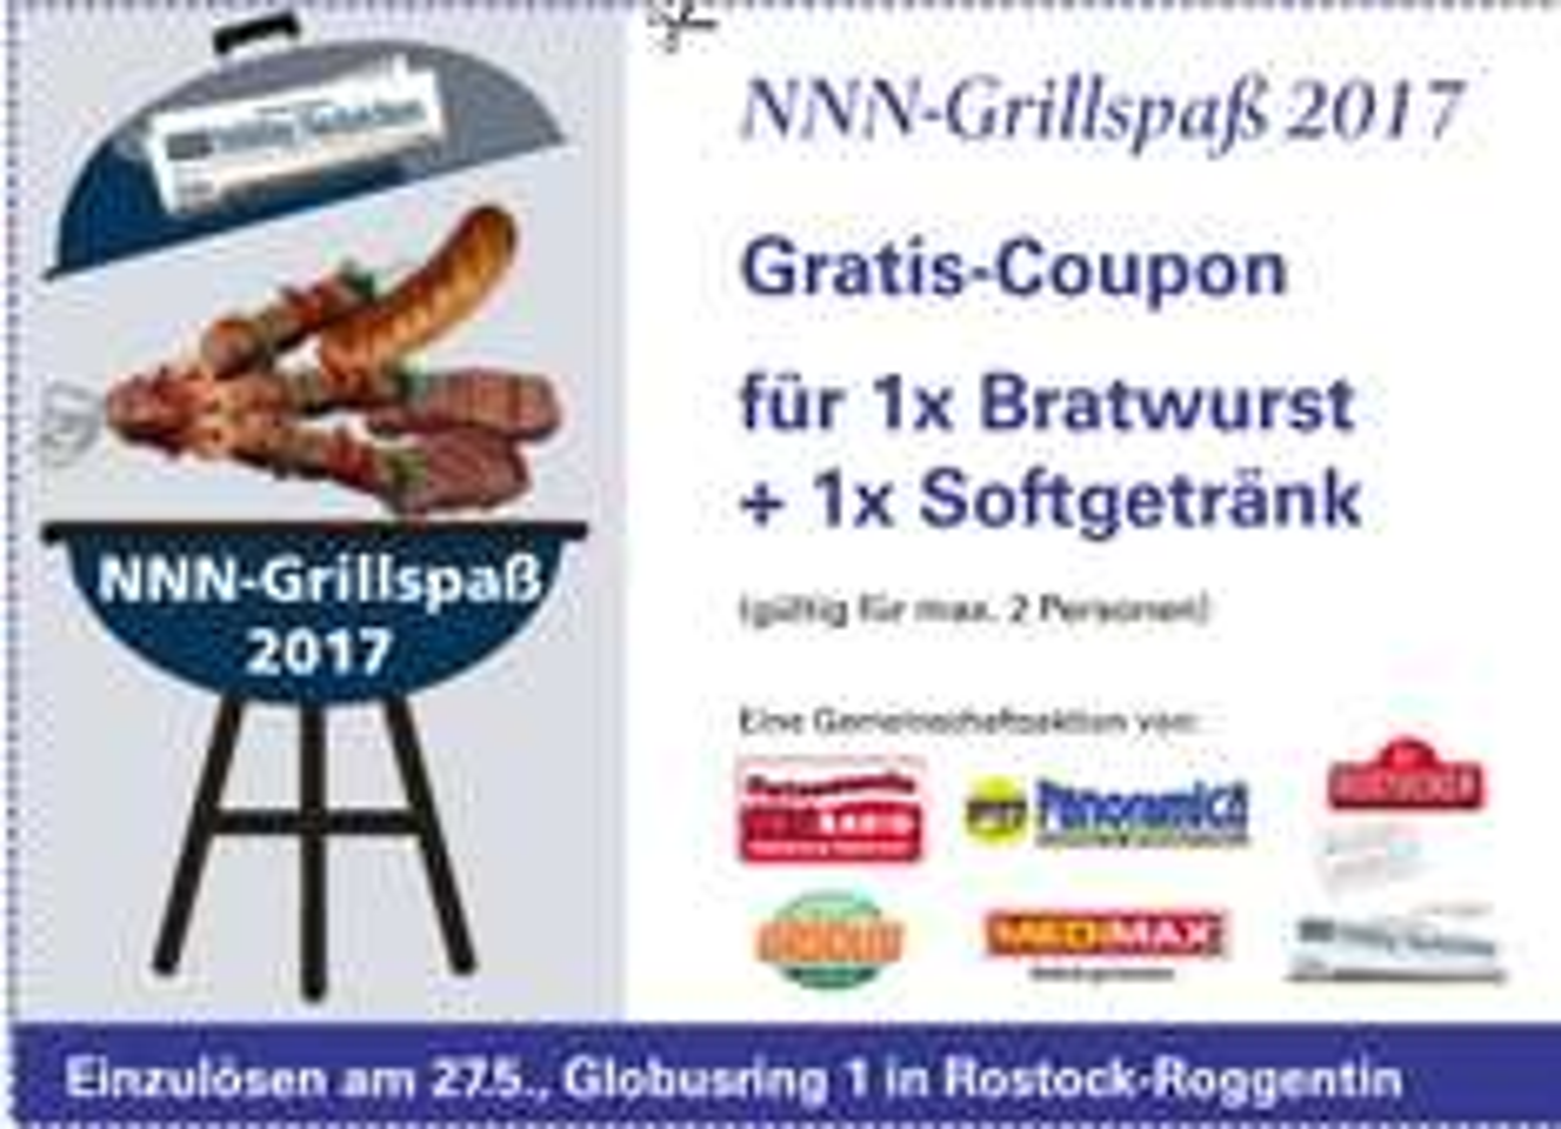 [Rostock] Gratis Bratwurst + Softgetränk beim NNN-Grillspaß [2] am 27.05.17